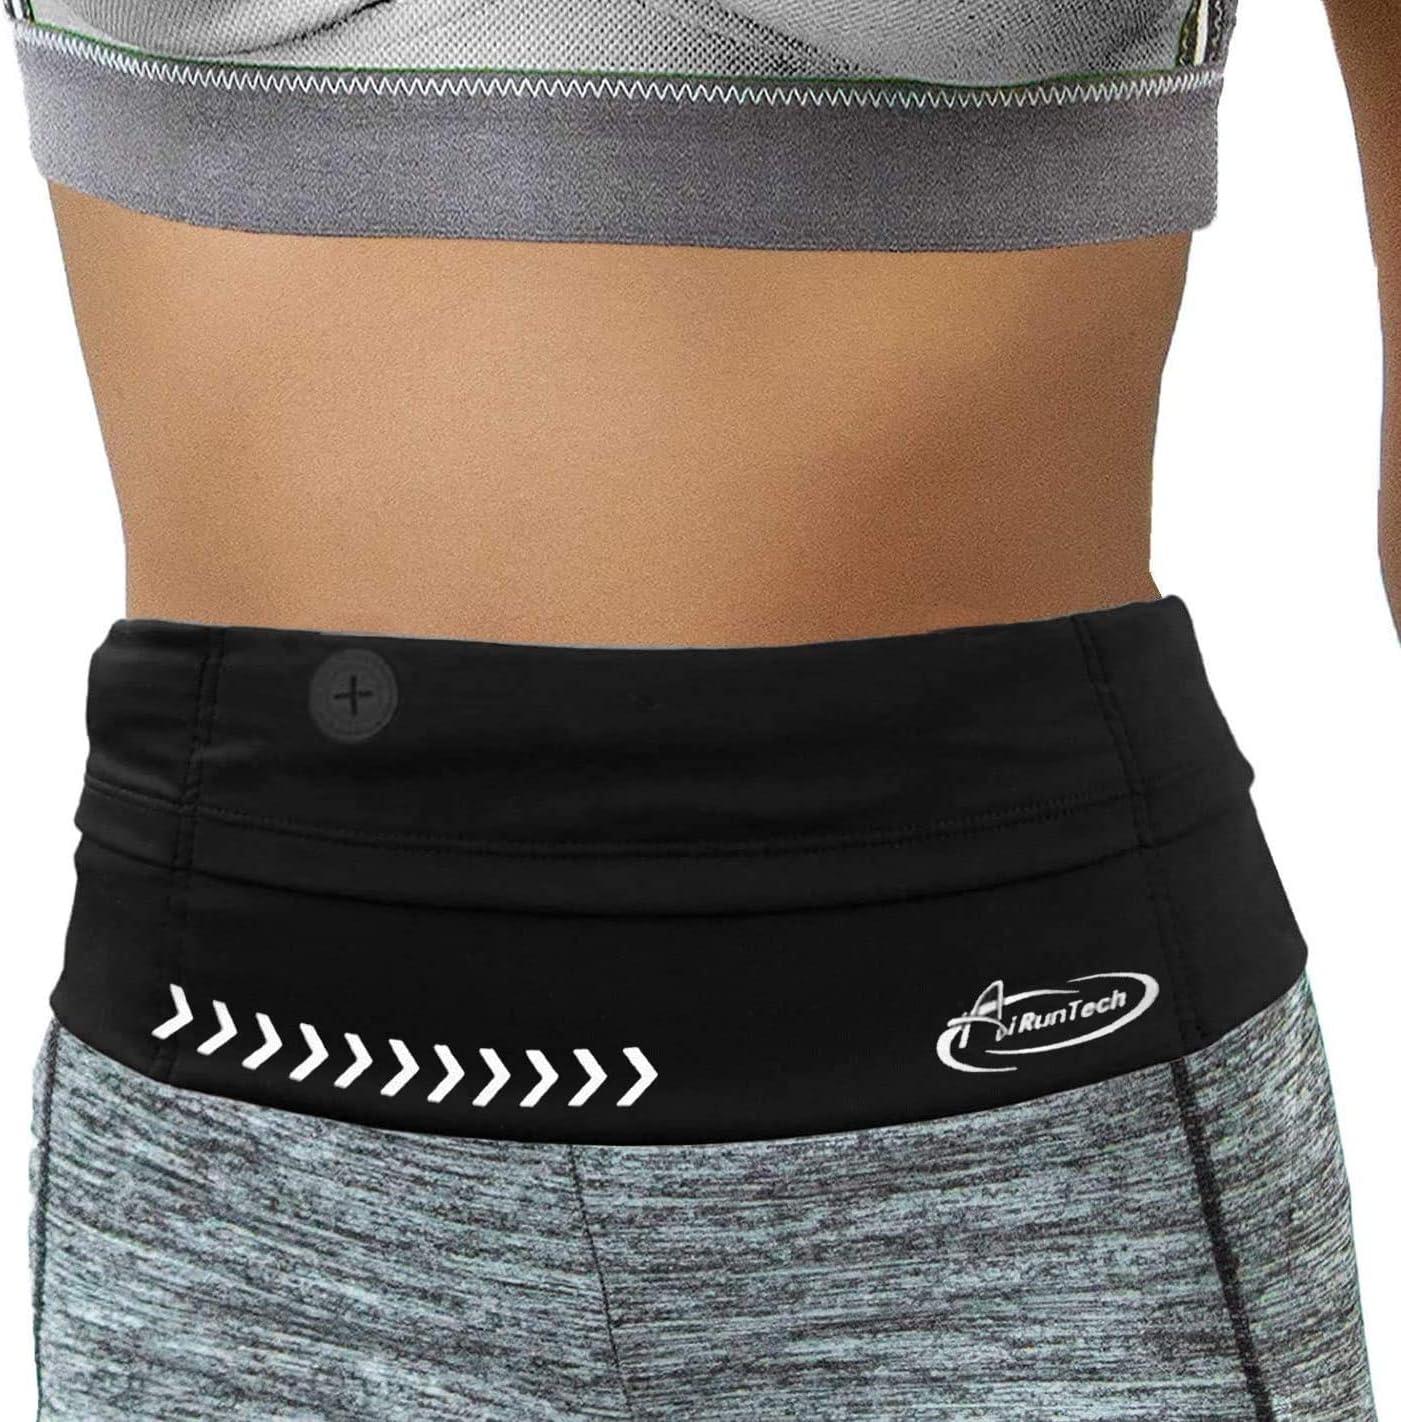 Running Belt GENERISE Waterproof Adjustable Running Belt for Phone Money etc